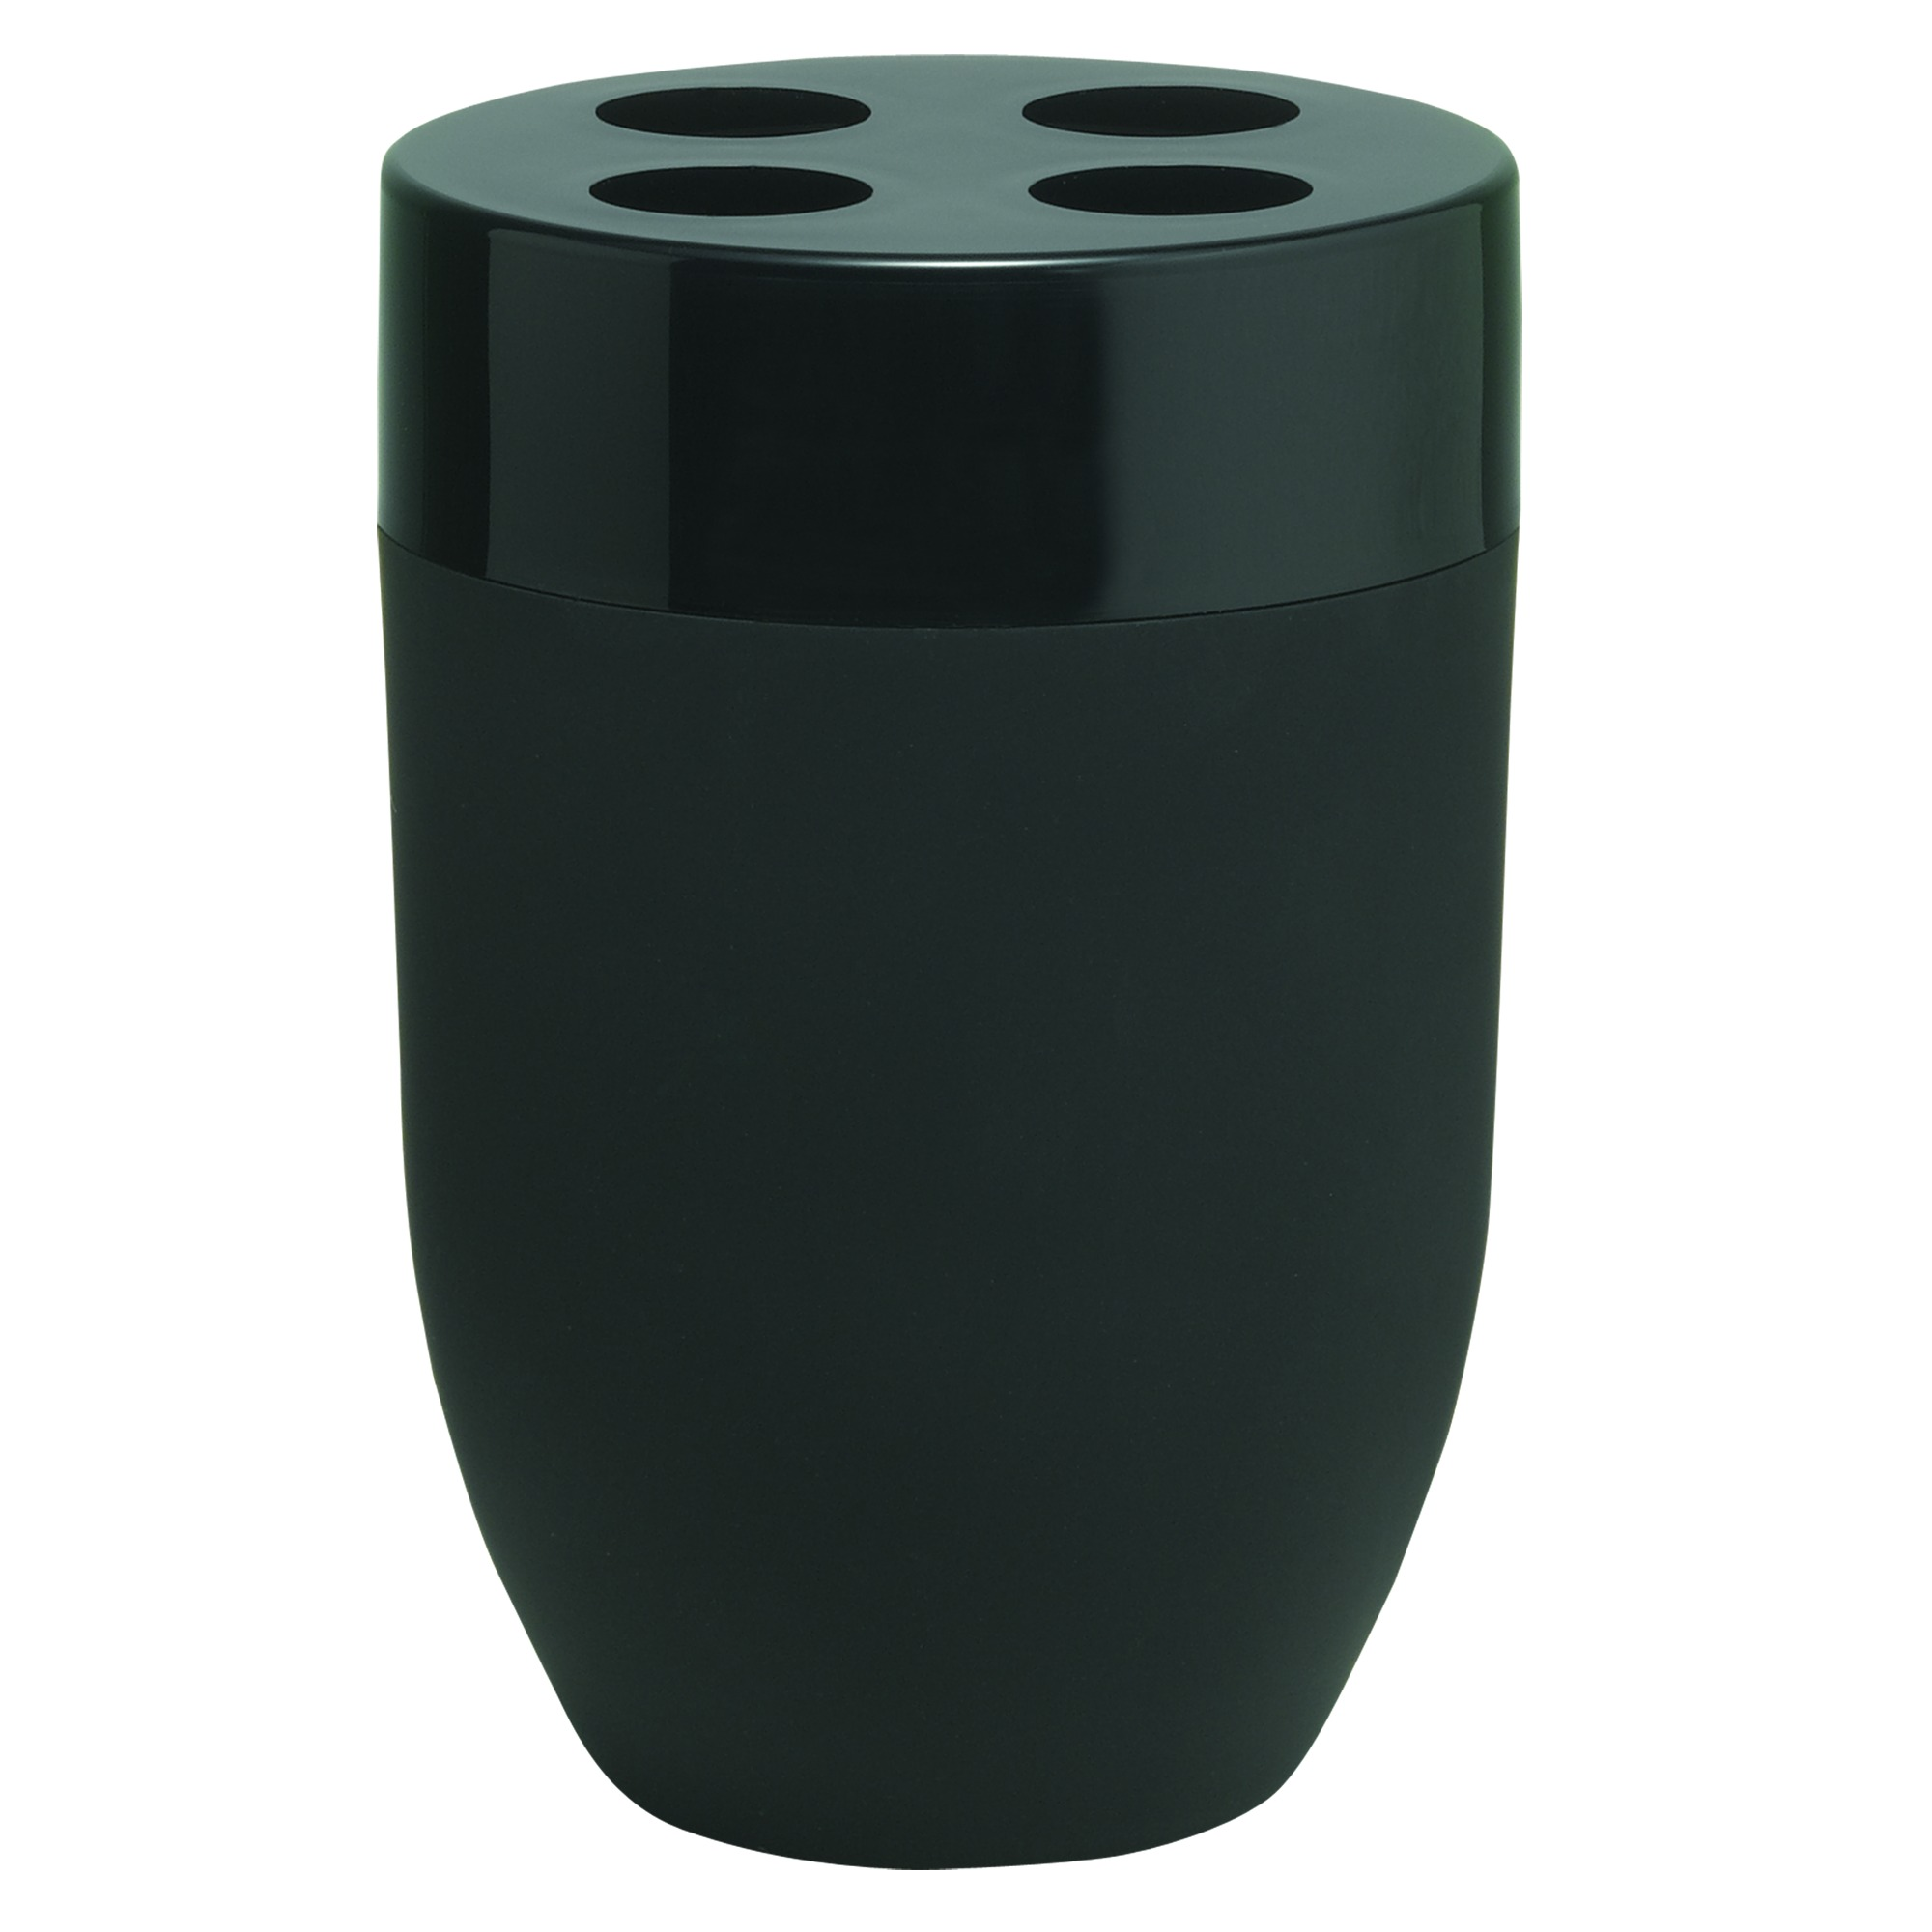 Sealskin Bloom tandenborstelhouder 7,5x11cm keramiek zwart